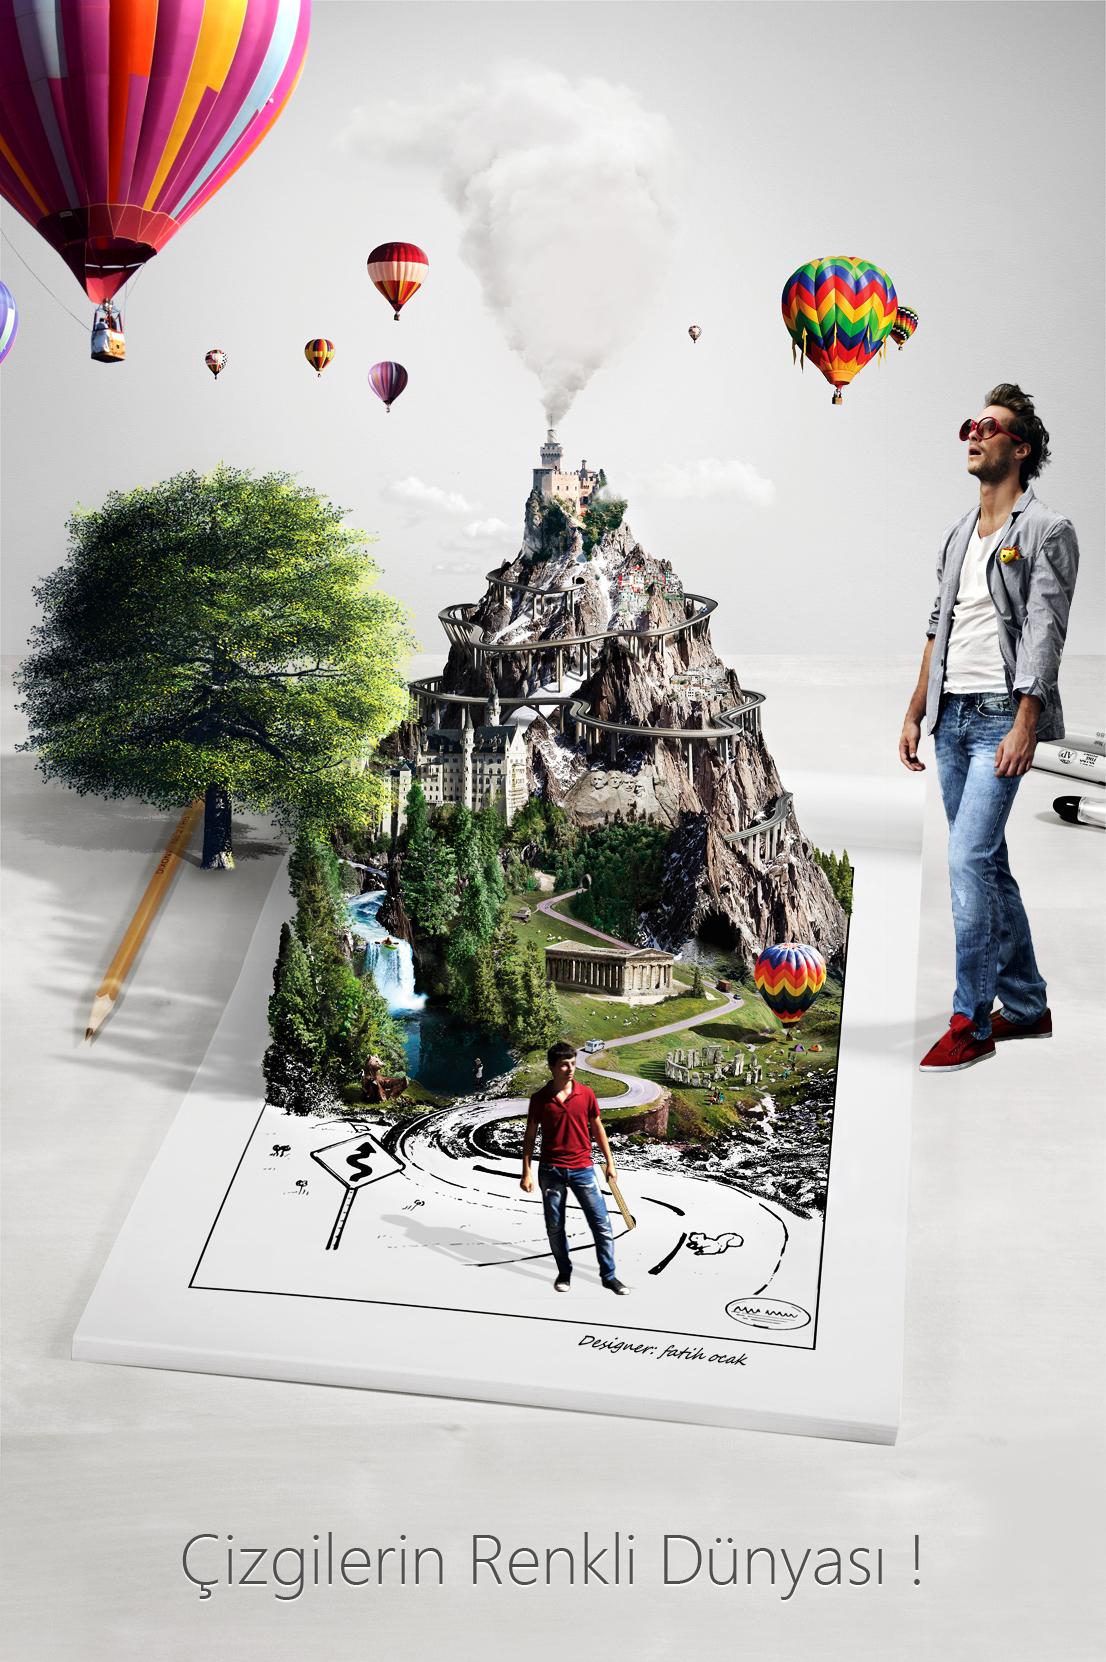 Poster design deviantart - My Creative Poster Design By Fatihocak Deviantart Com On Deviantart